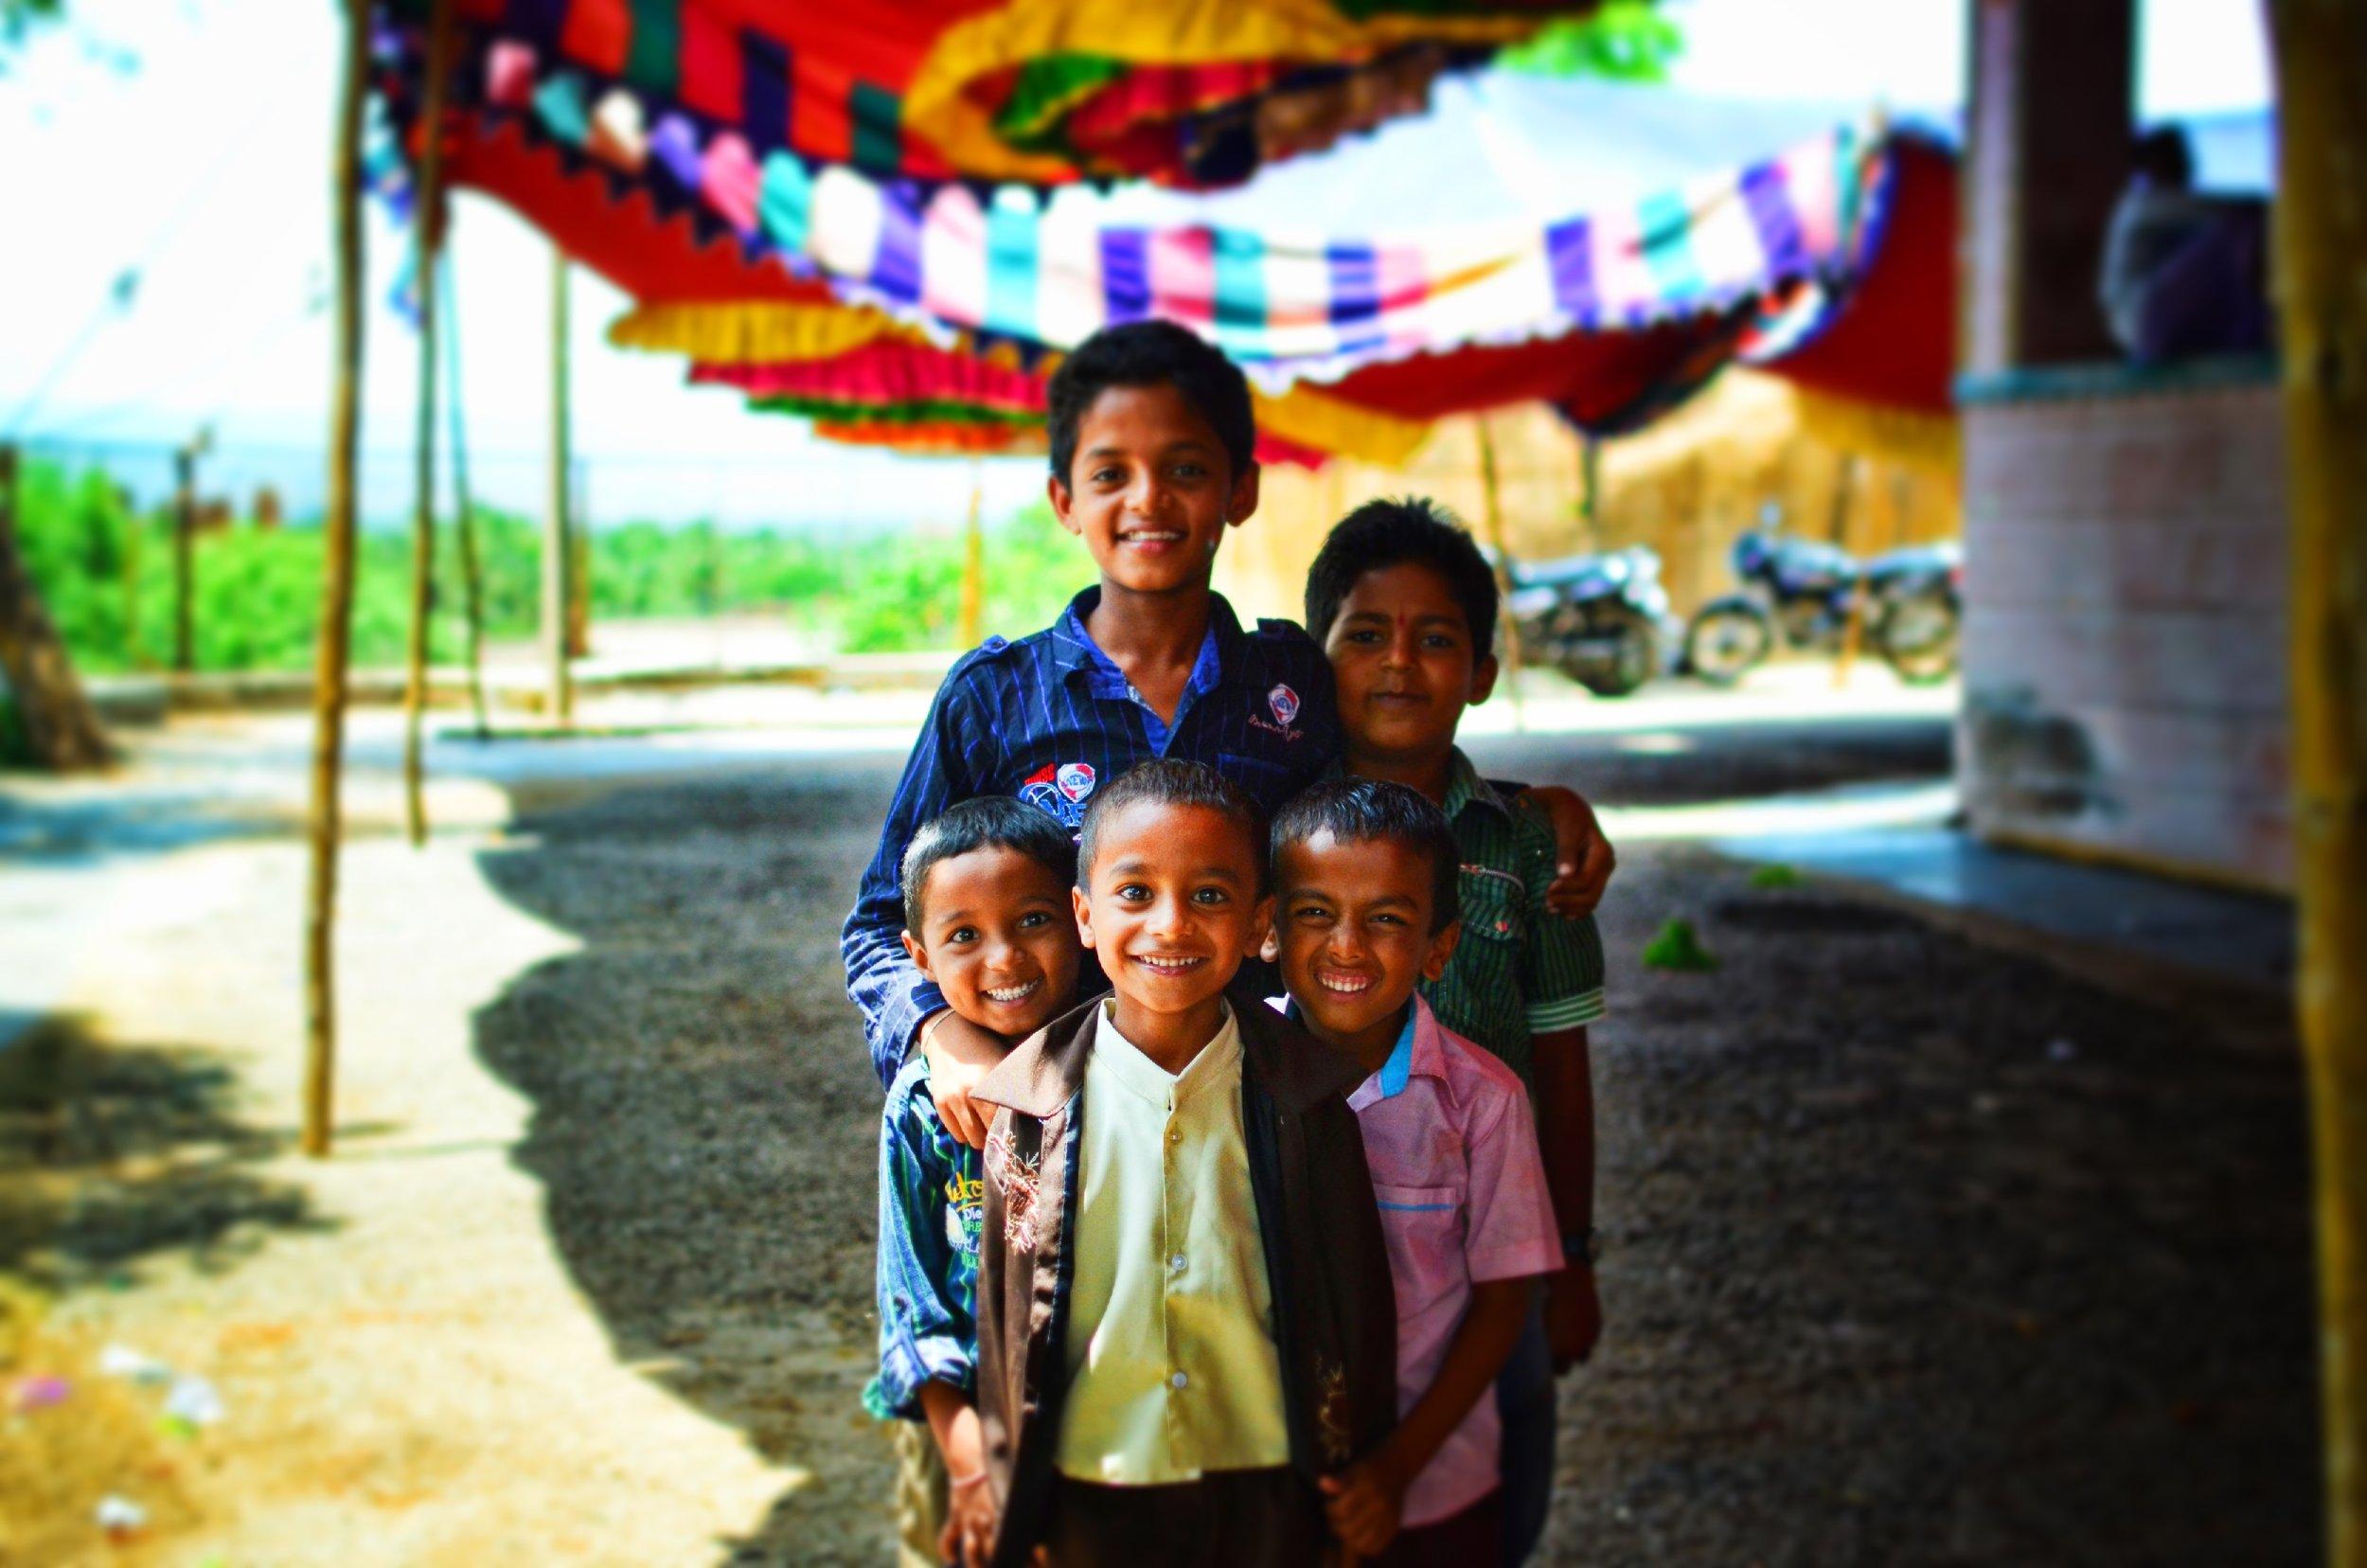 India kids.jpg